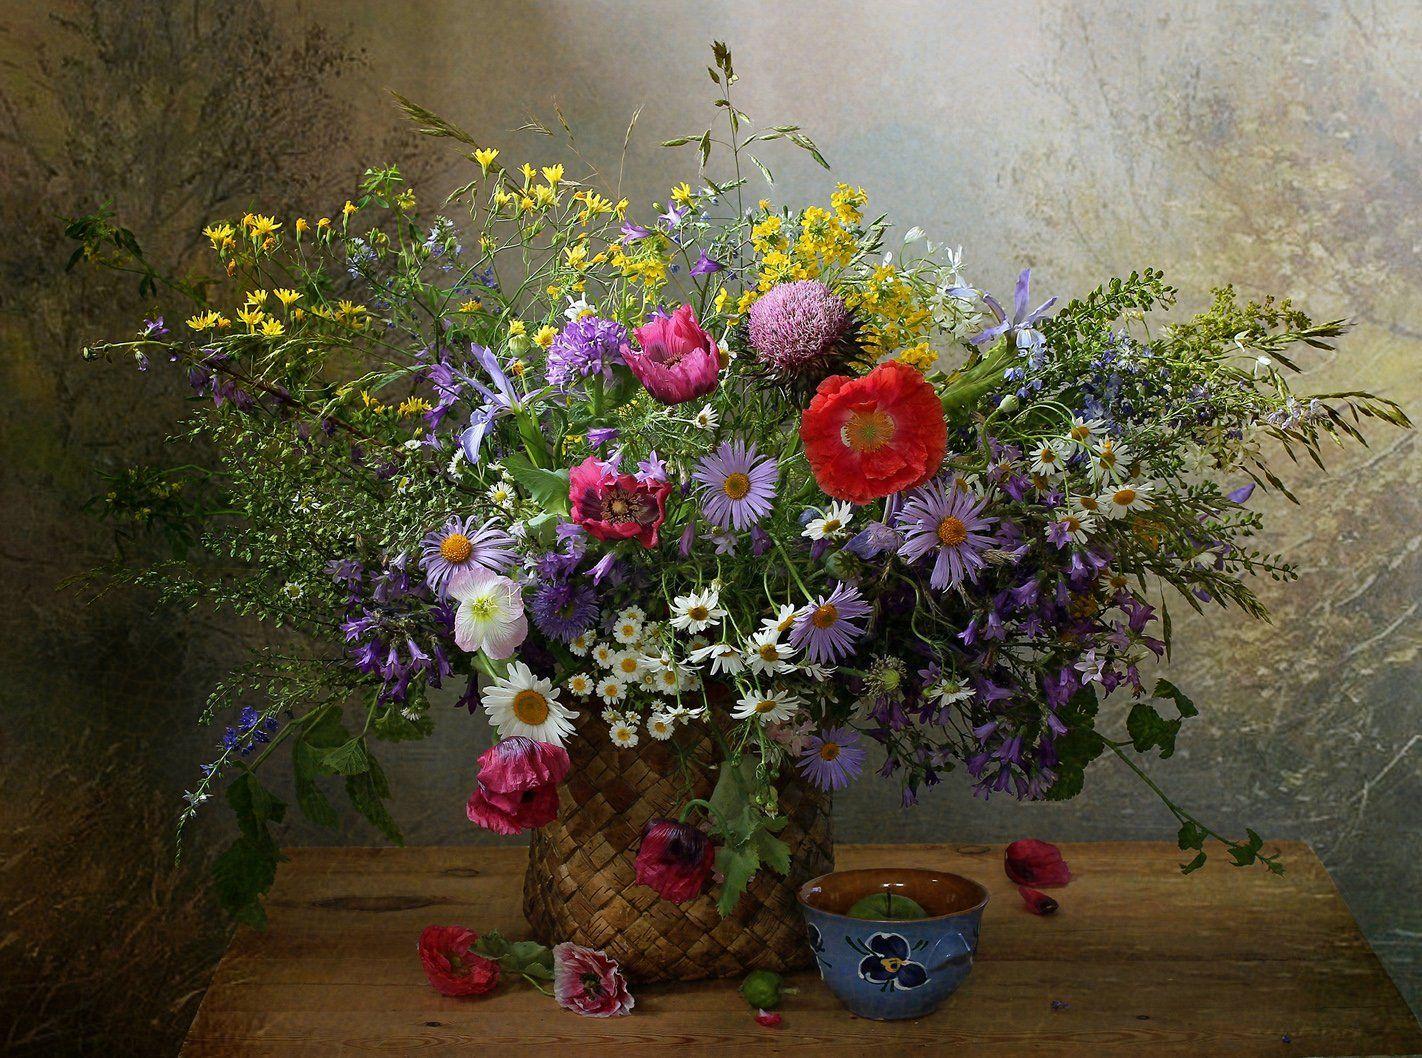 Аромат цветущих лугов (2) Филатова Марина